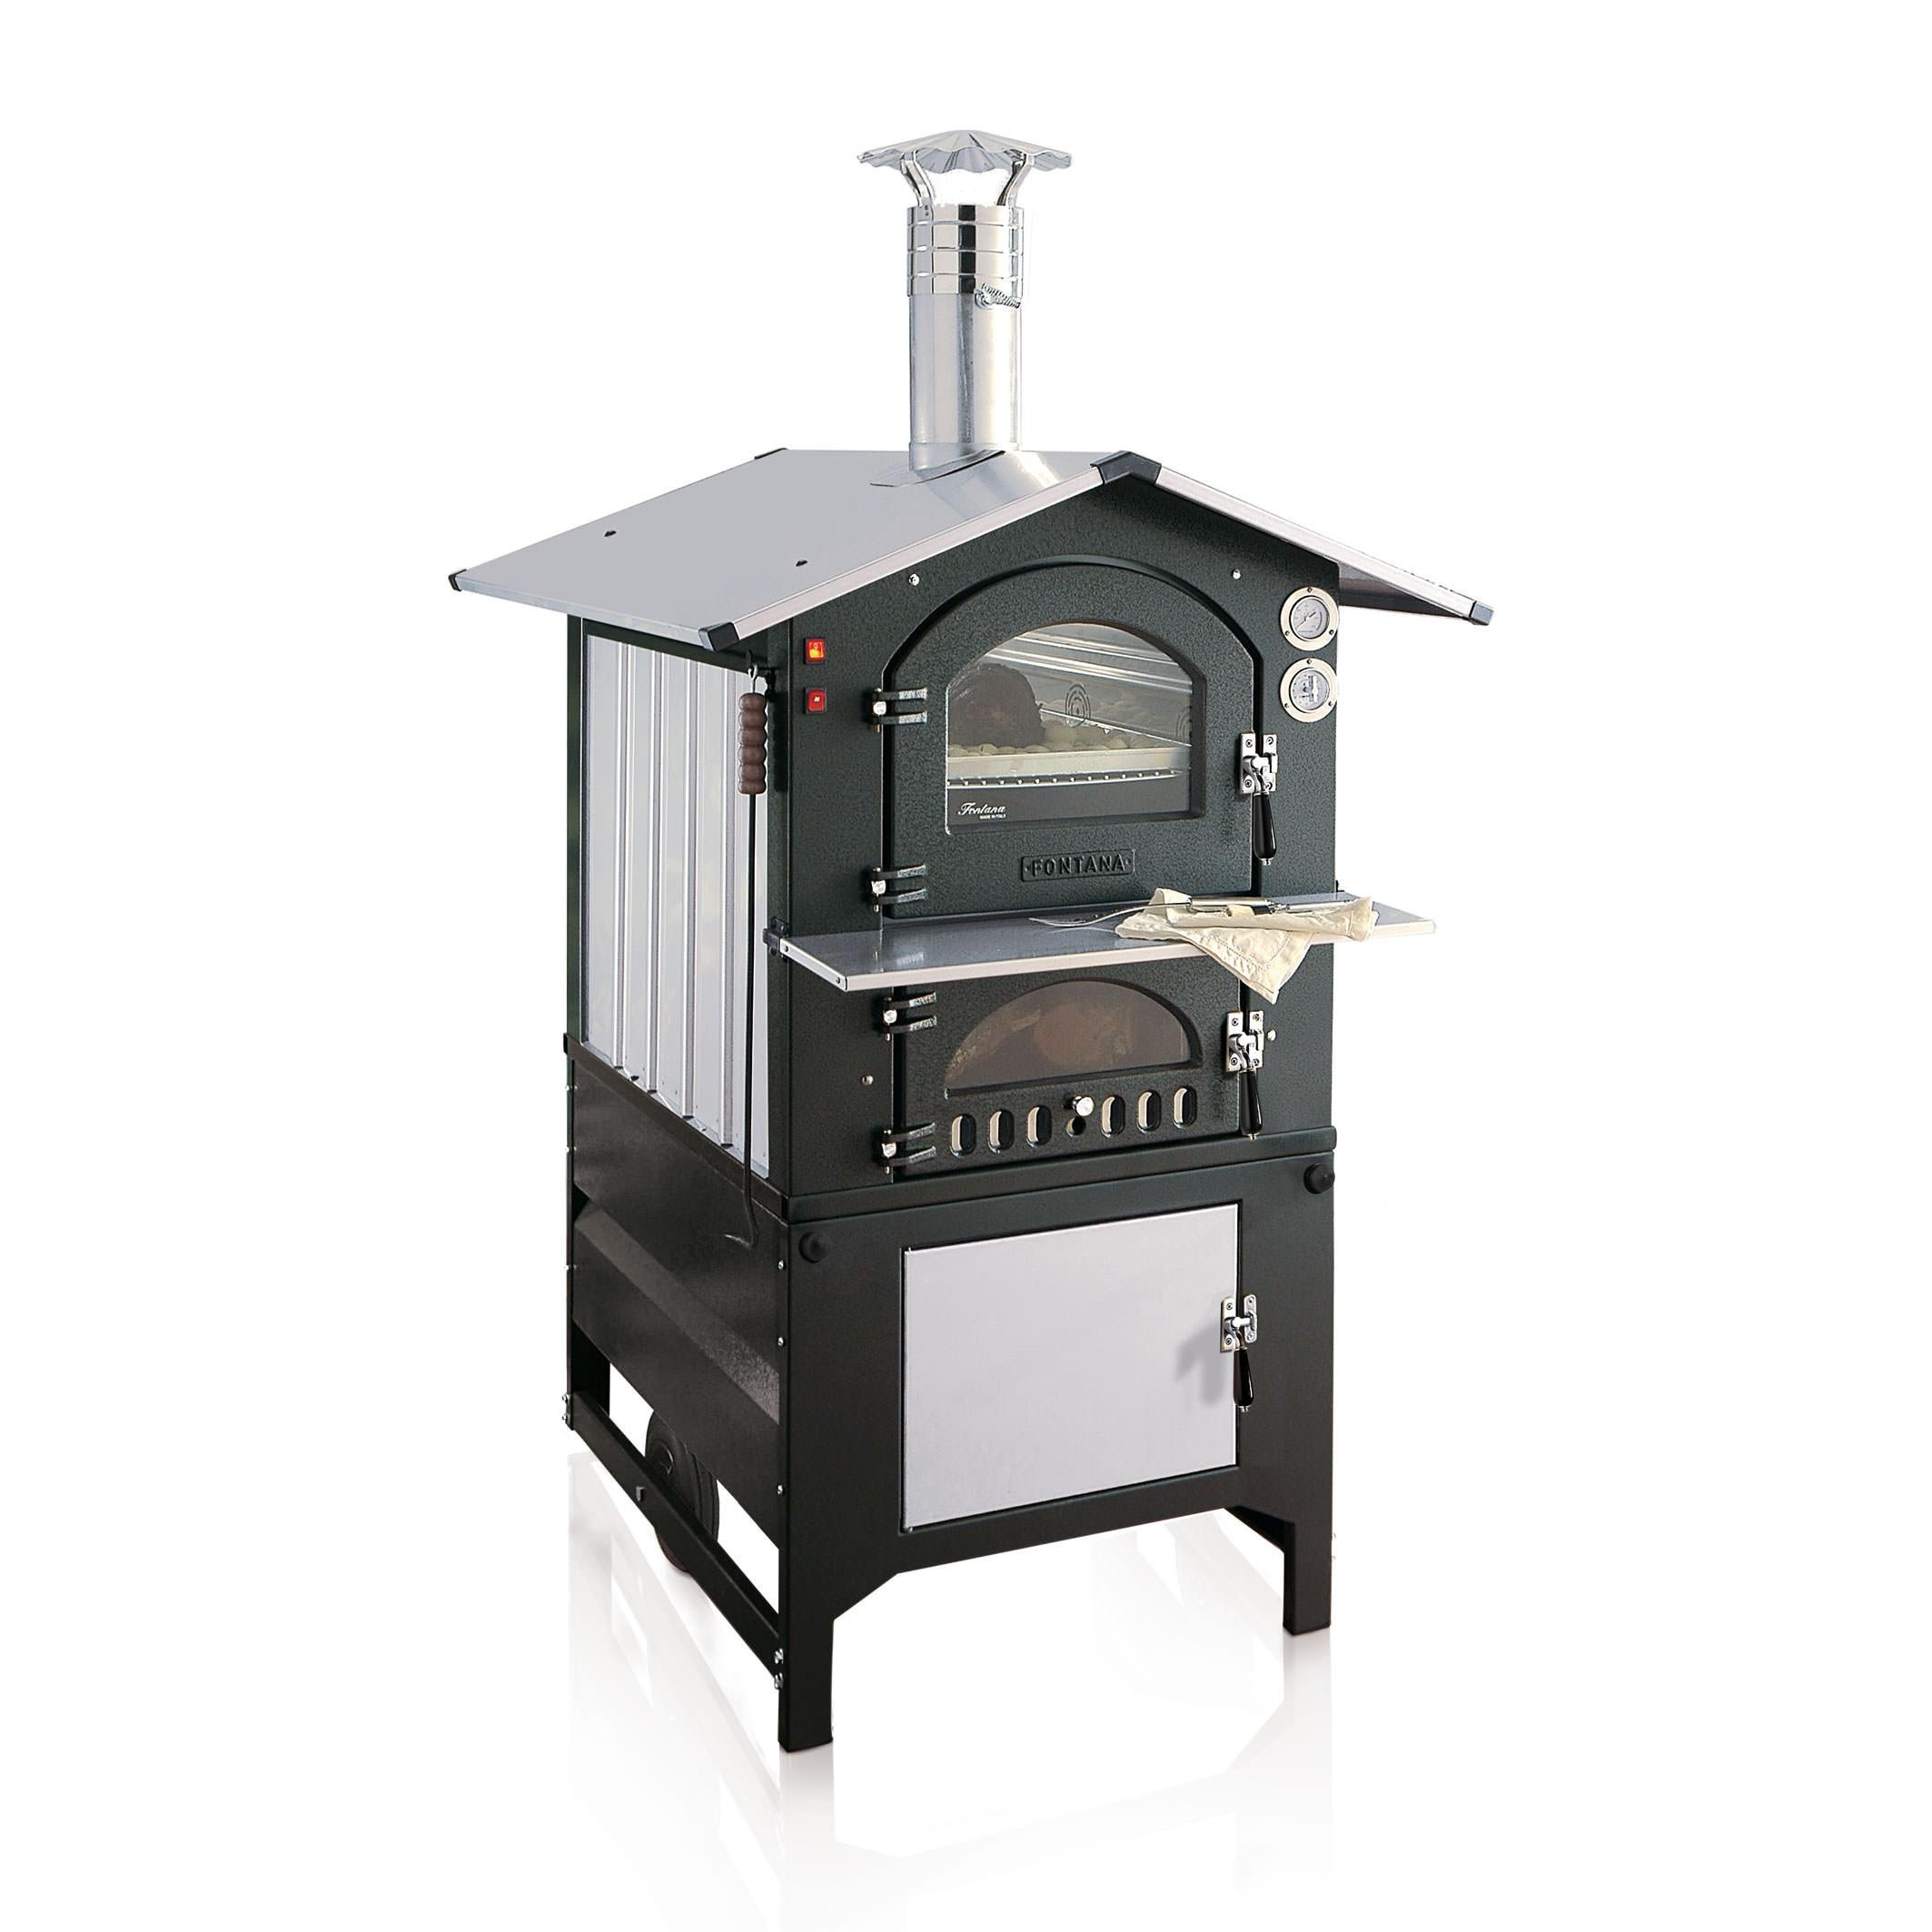 Fontana Forni Pizza Oven Hamilton Ontario